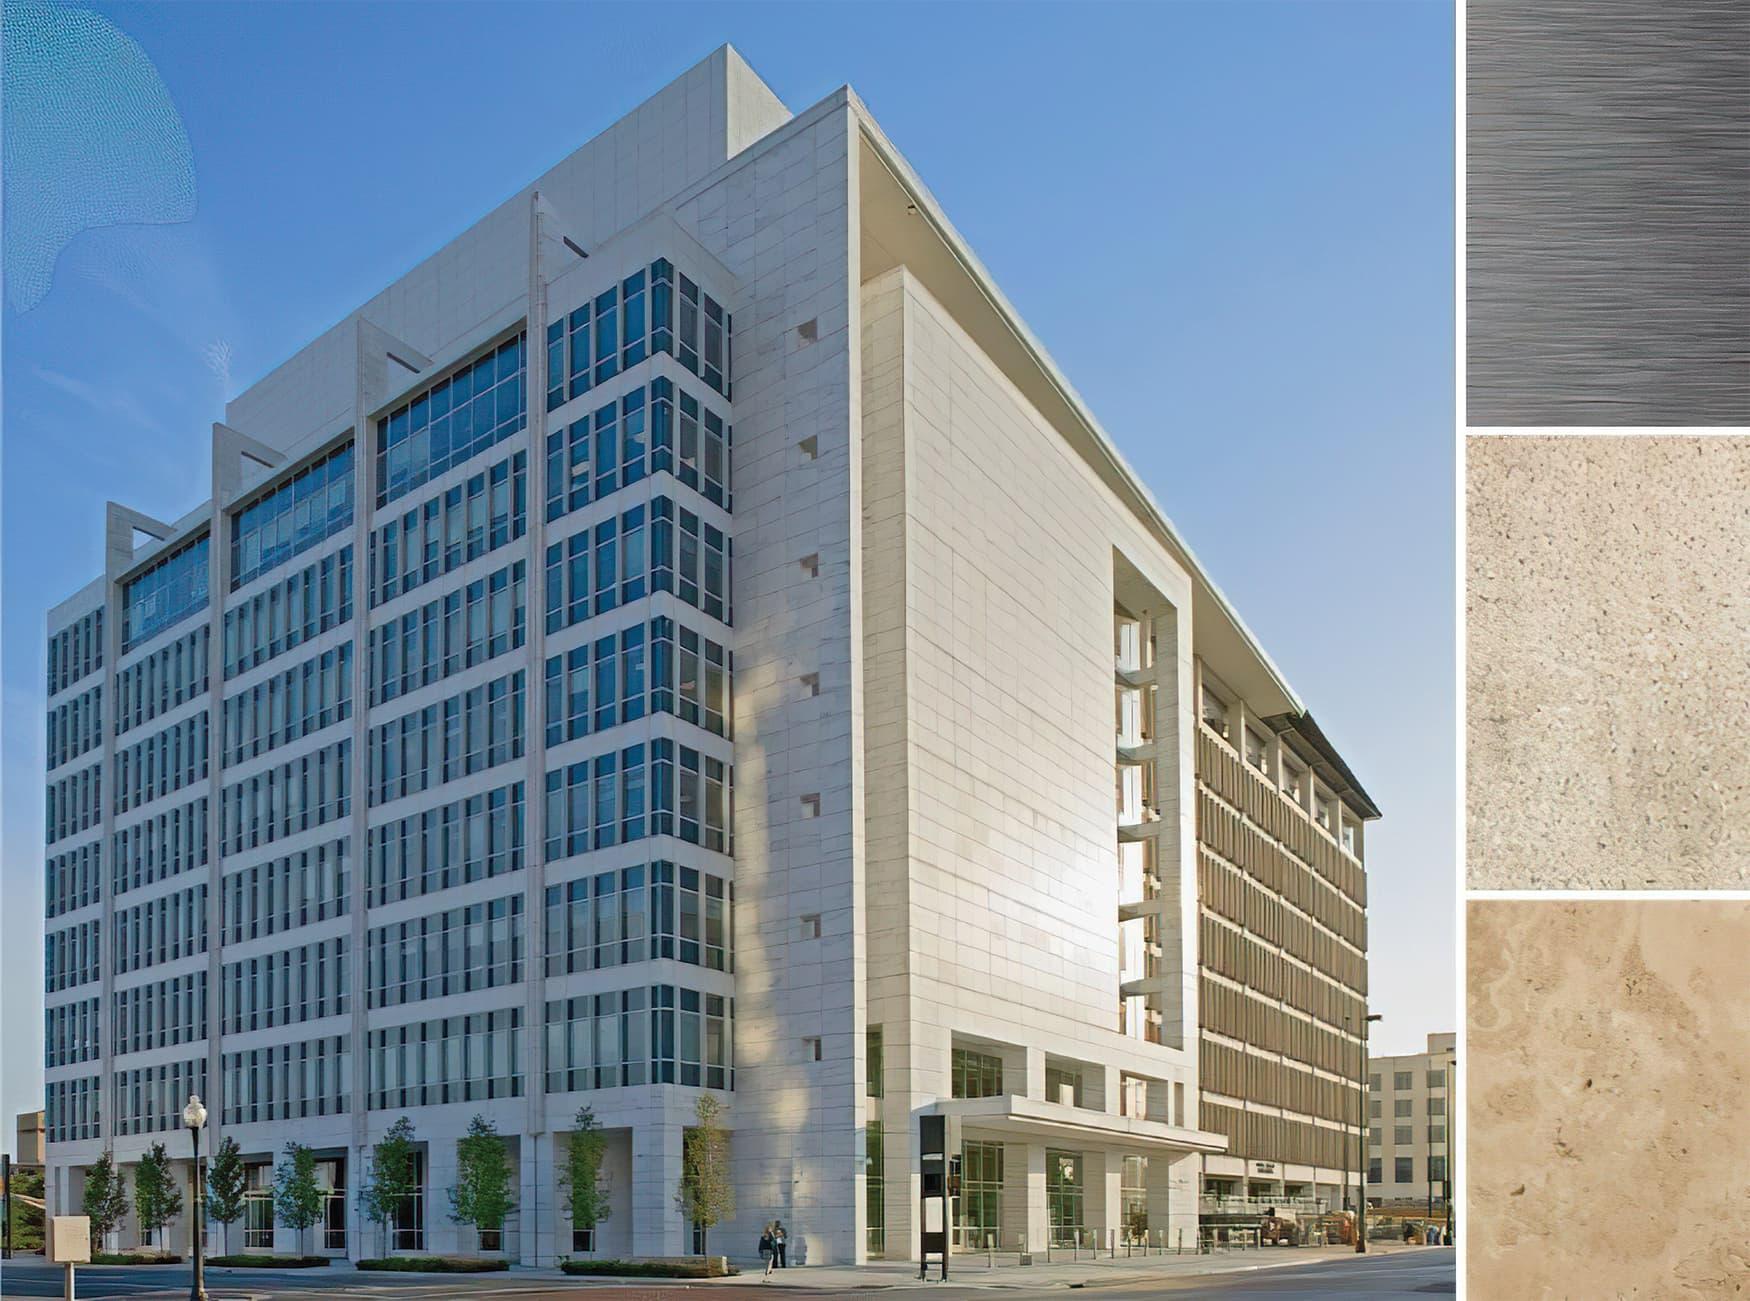 George L. Allen Sr. Courts Building. Civic Design, Workplace Design. Dallas, Texas.